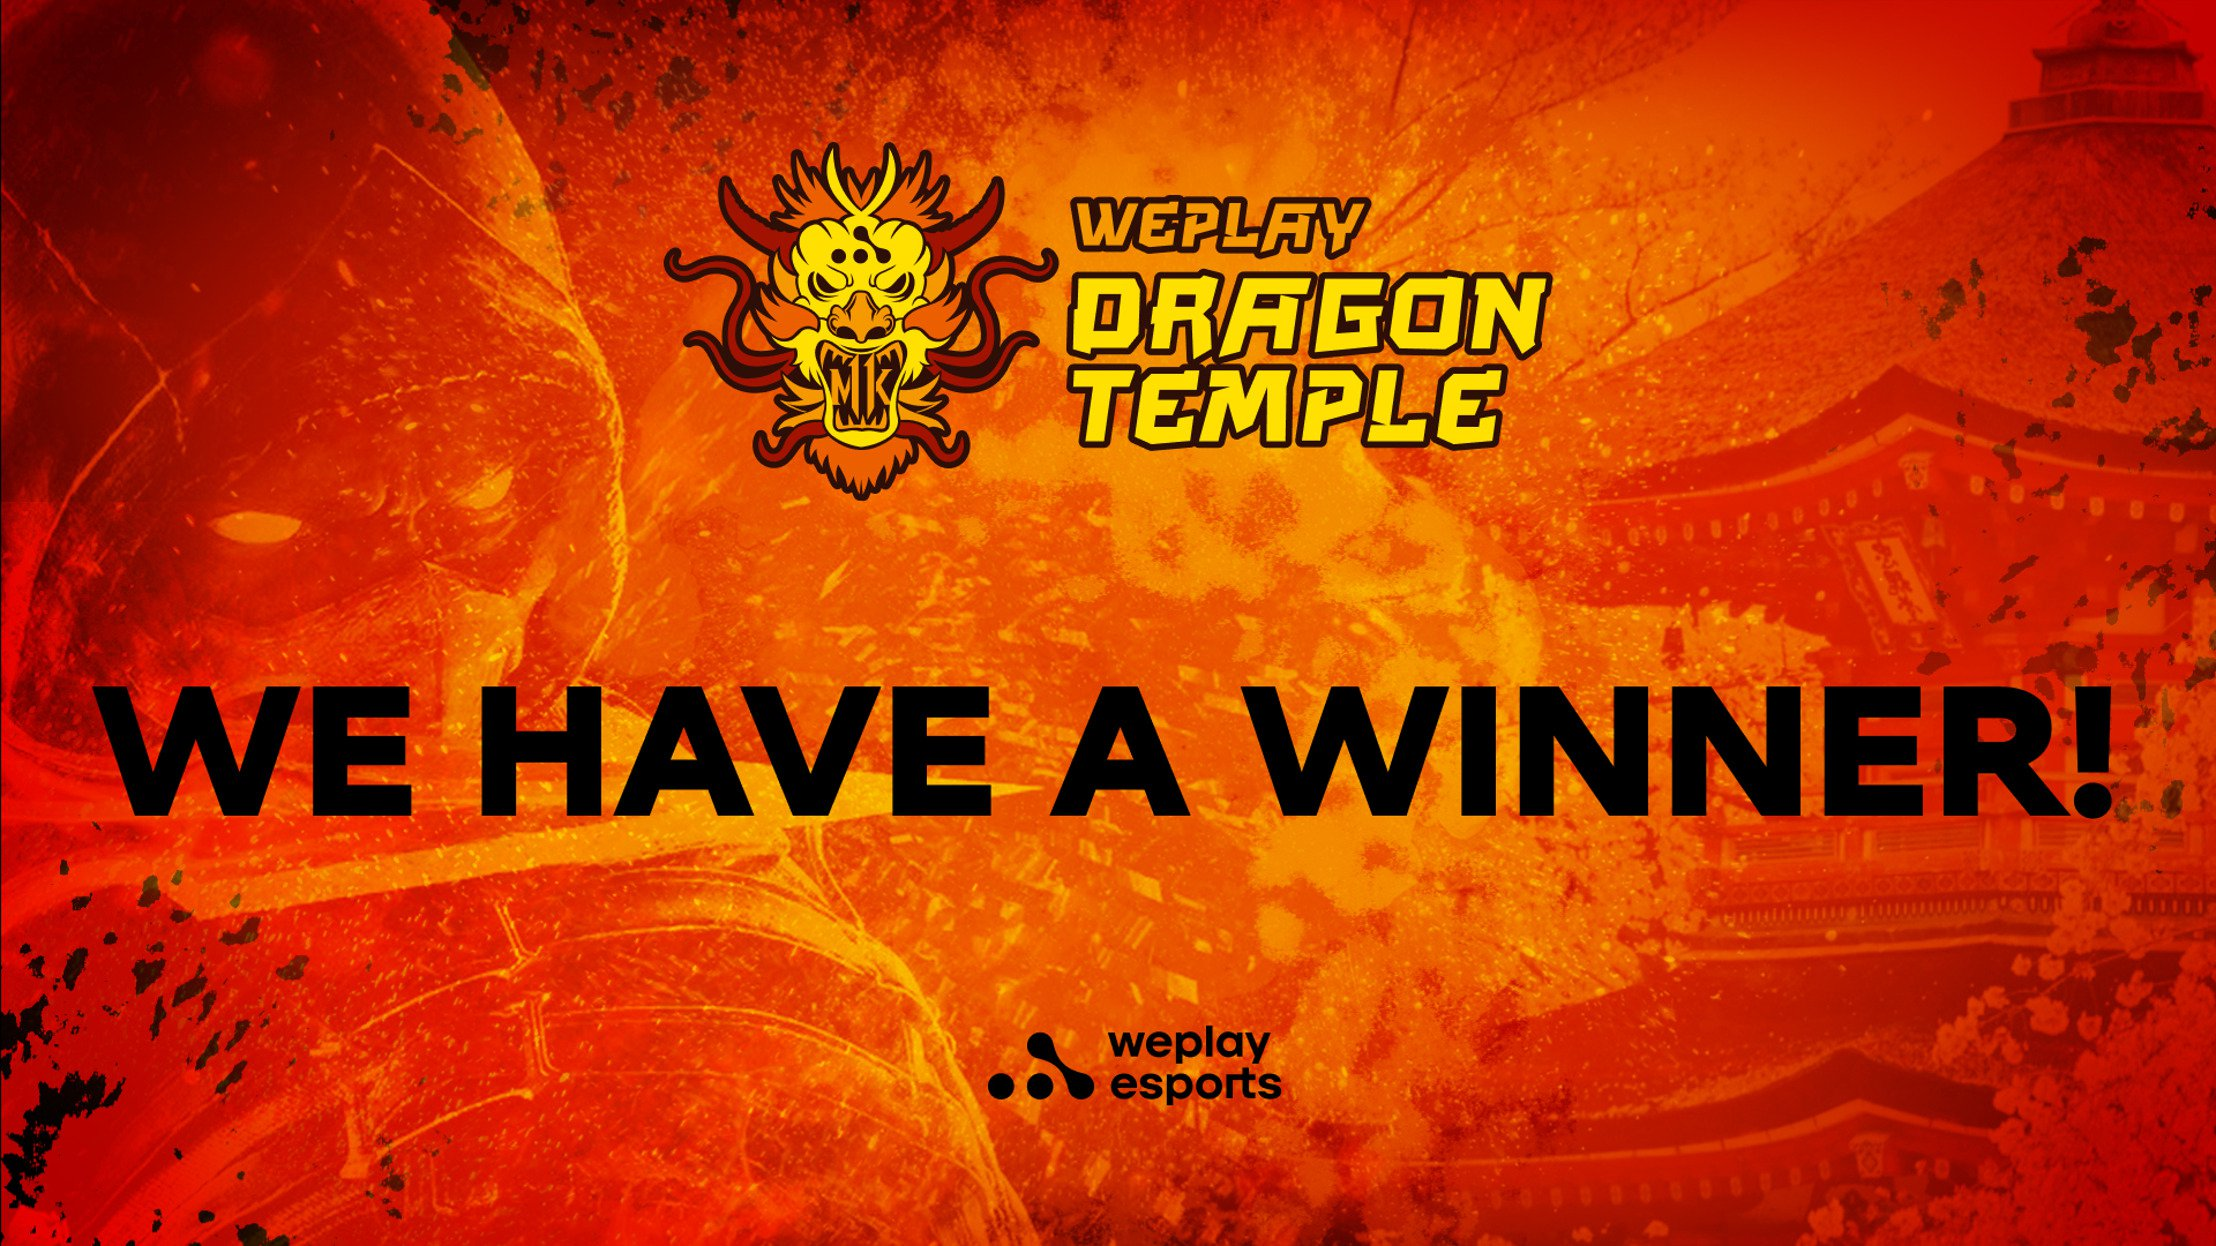 Meet the WePlay Dragon Temple Winner